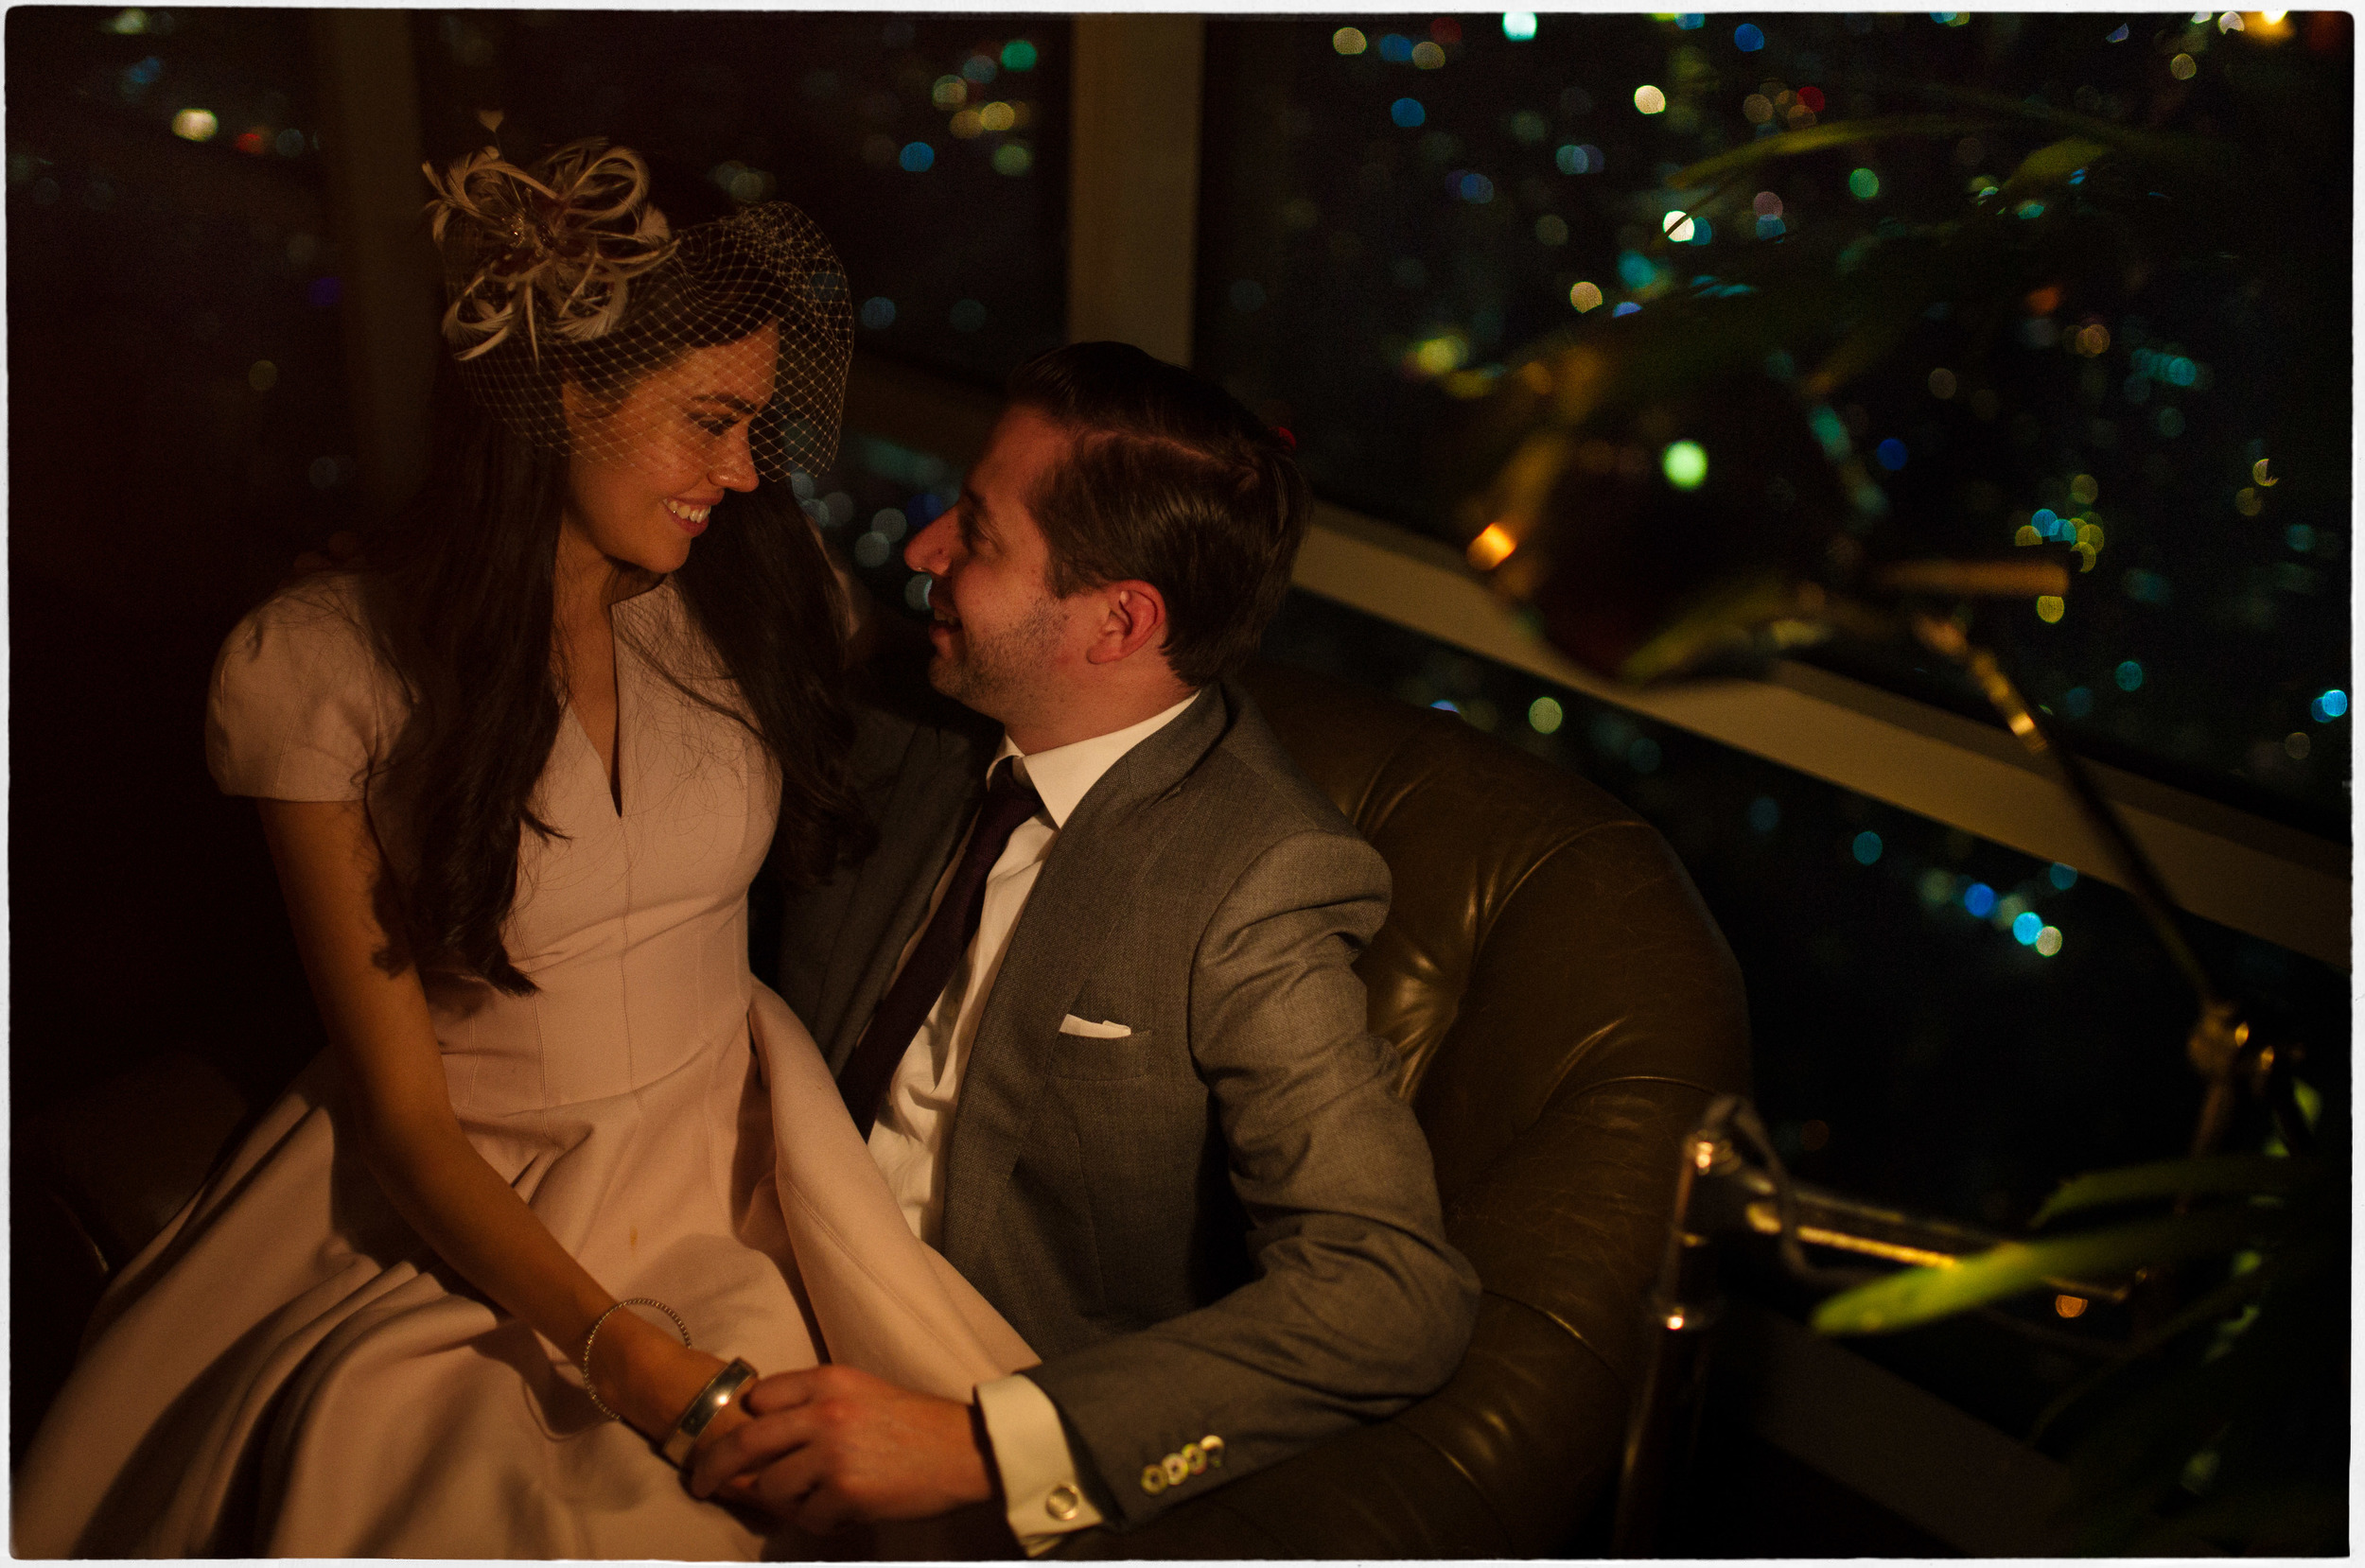 MaurizioSolisBroca.Photography-piso51-mexico-torre mayor-cdmx-20151128DSC04820-Edit.jpg